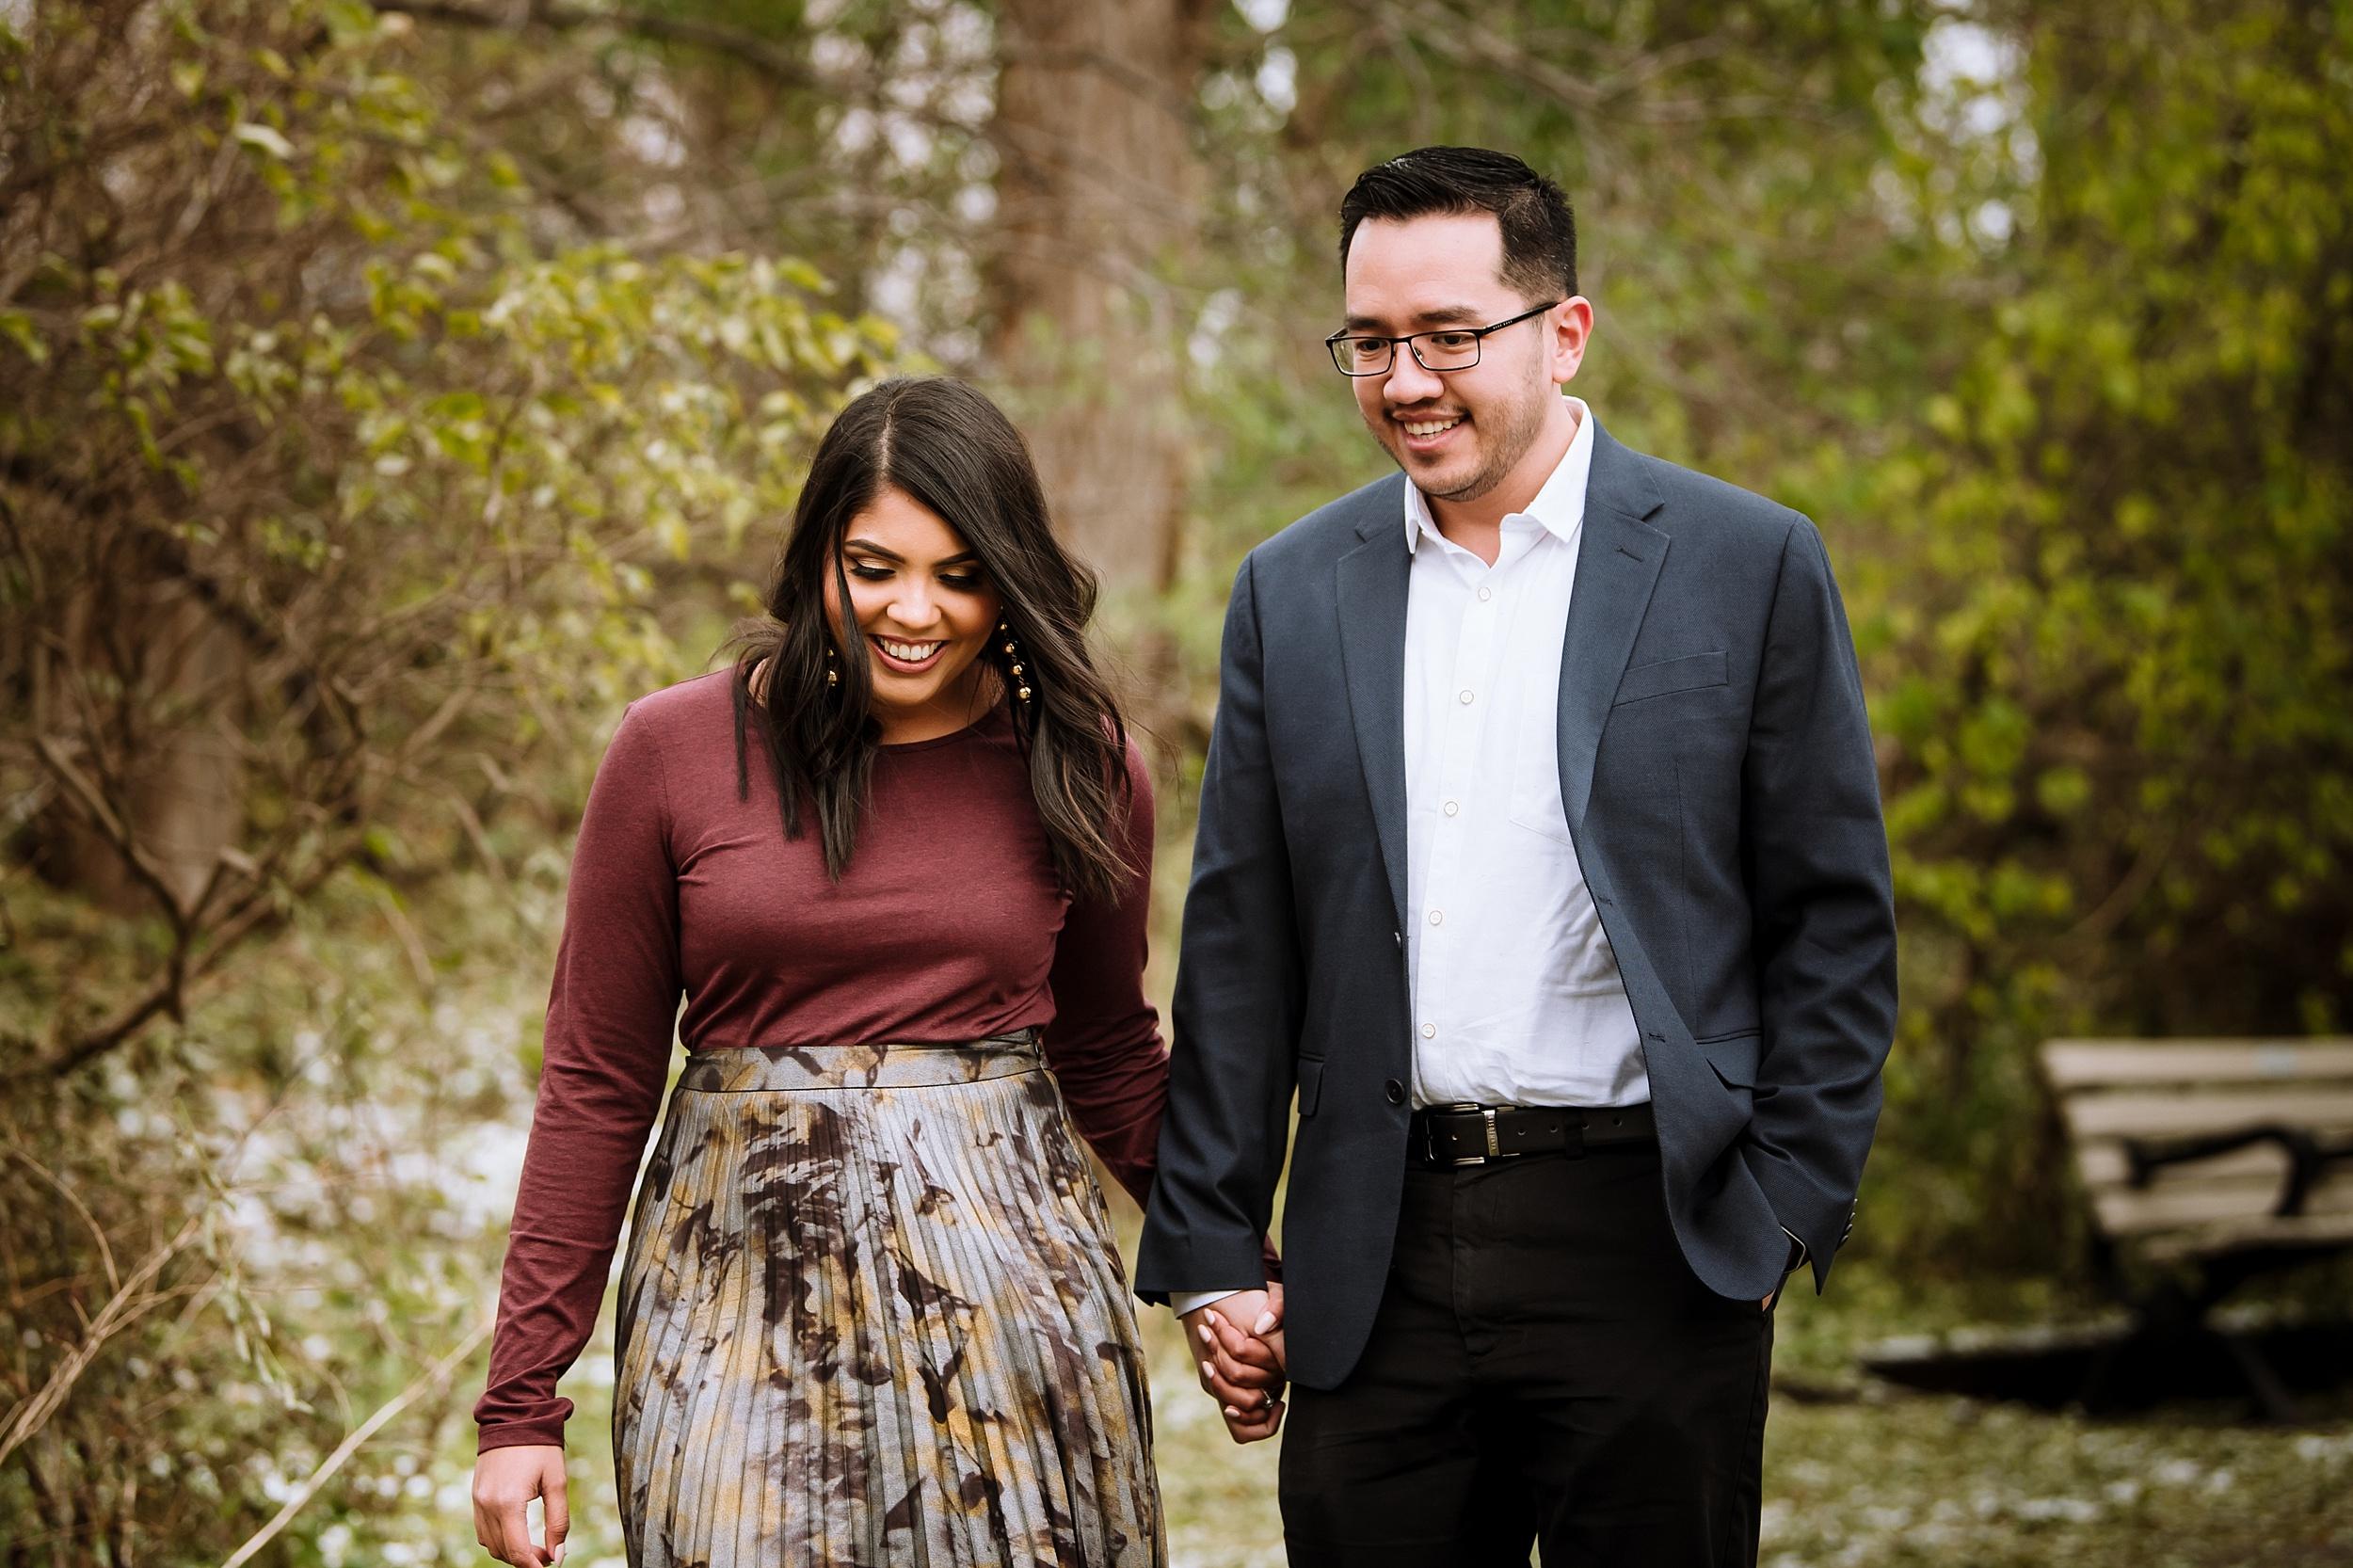 Alexander_Muir_Memorial_Gardens_Engagement_Shoot_Toronto_Wedding_Photographer_0001.jpg